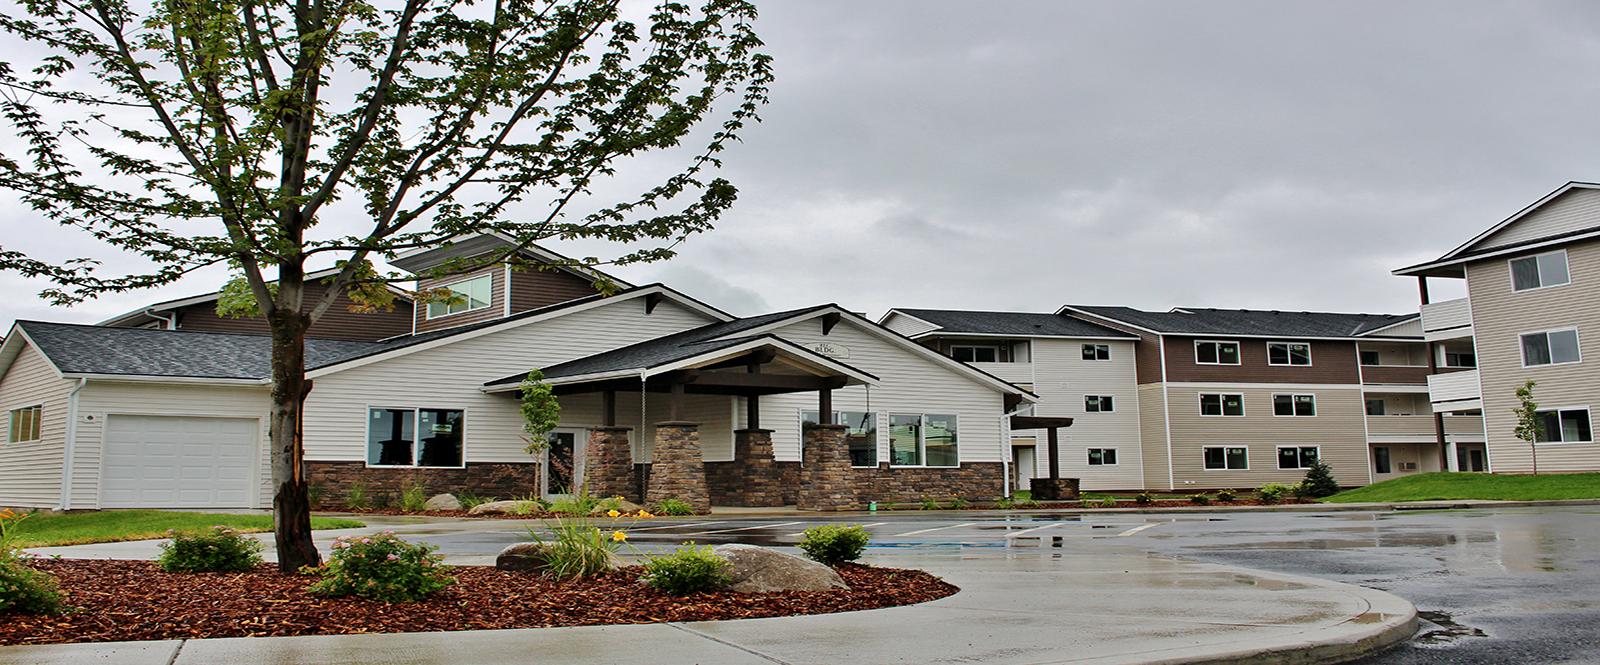 Spokane Valley photogallery 2